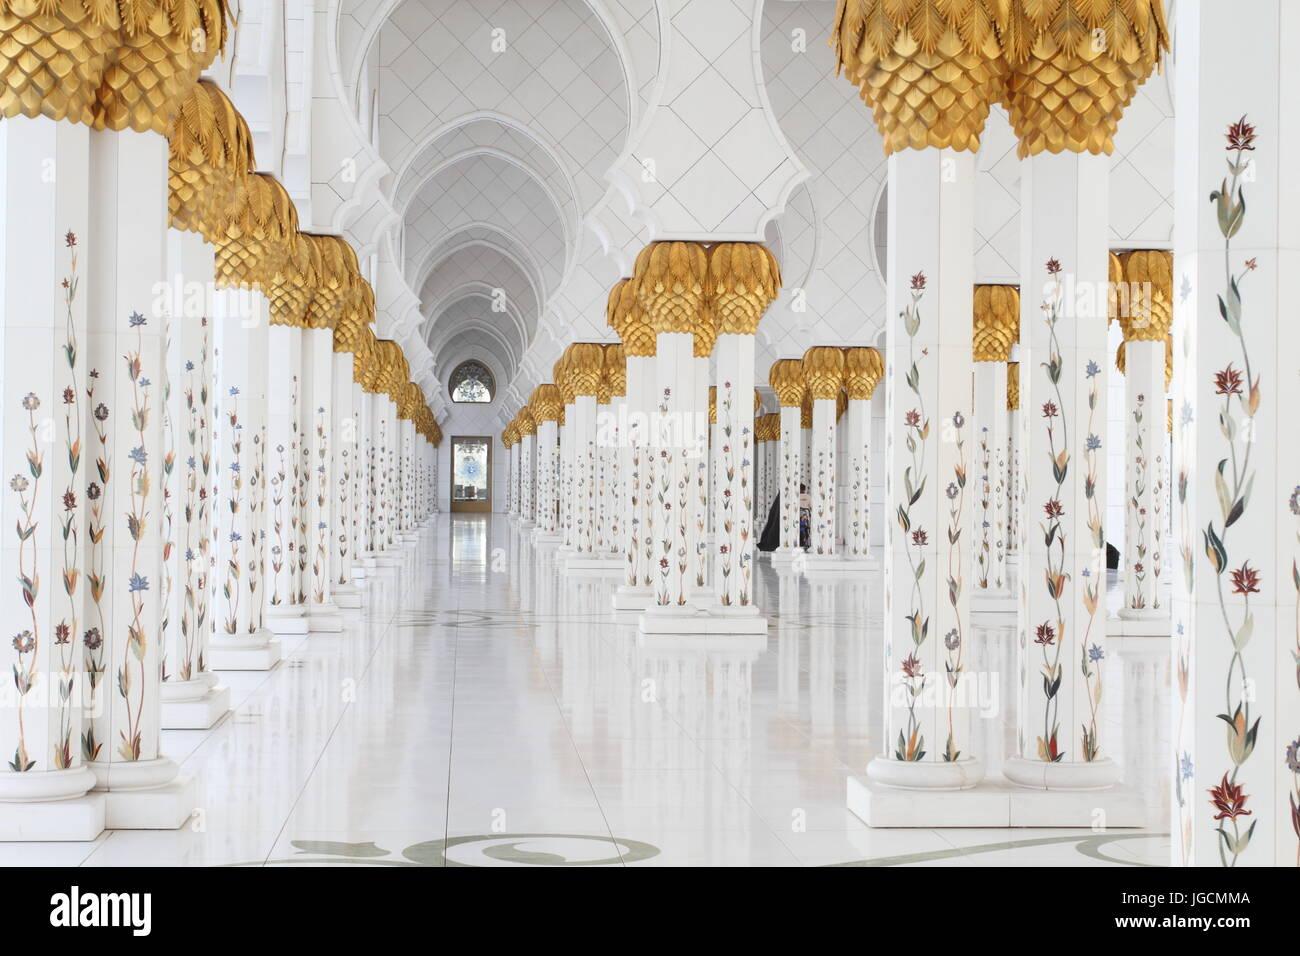 Abu Dhabi, Abu Dhabi, China. 6th July, 2017. Sheikh Zayed Grand Mosque is located in Abu Dhabi, the capital city Stock Photo